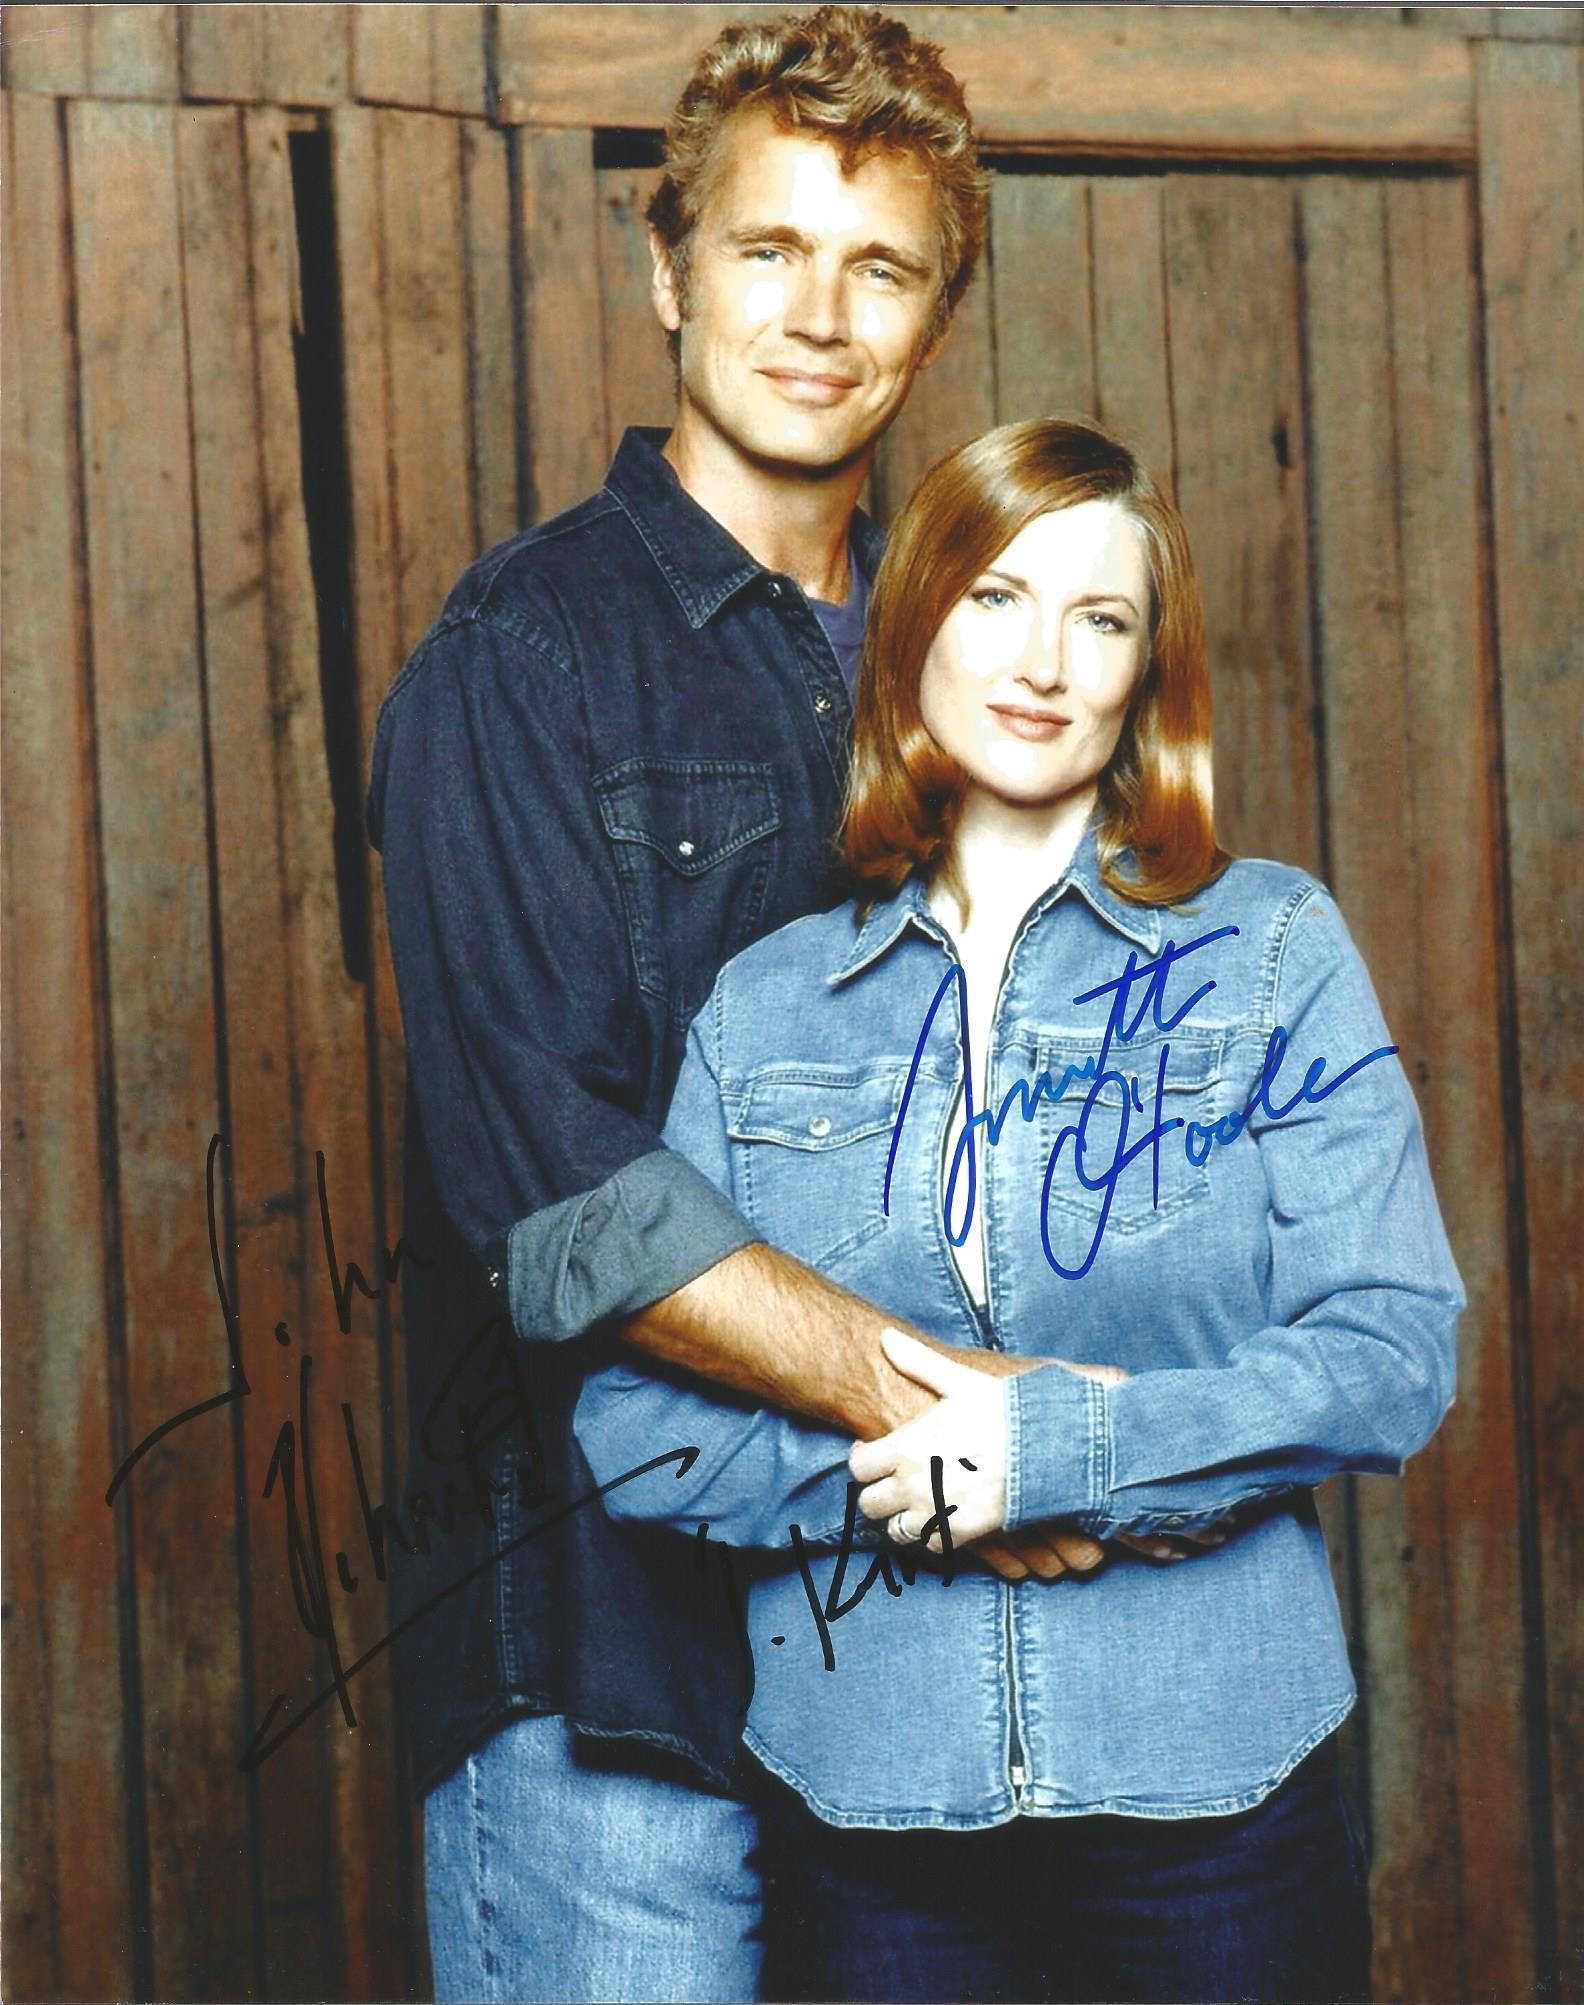 Lot 43 - Smallville Cast signed 10 x 8 colour Portrait Photo Signed By Annette Ostiole And John Schneider,